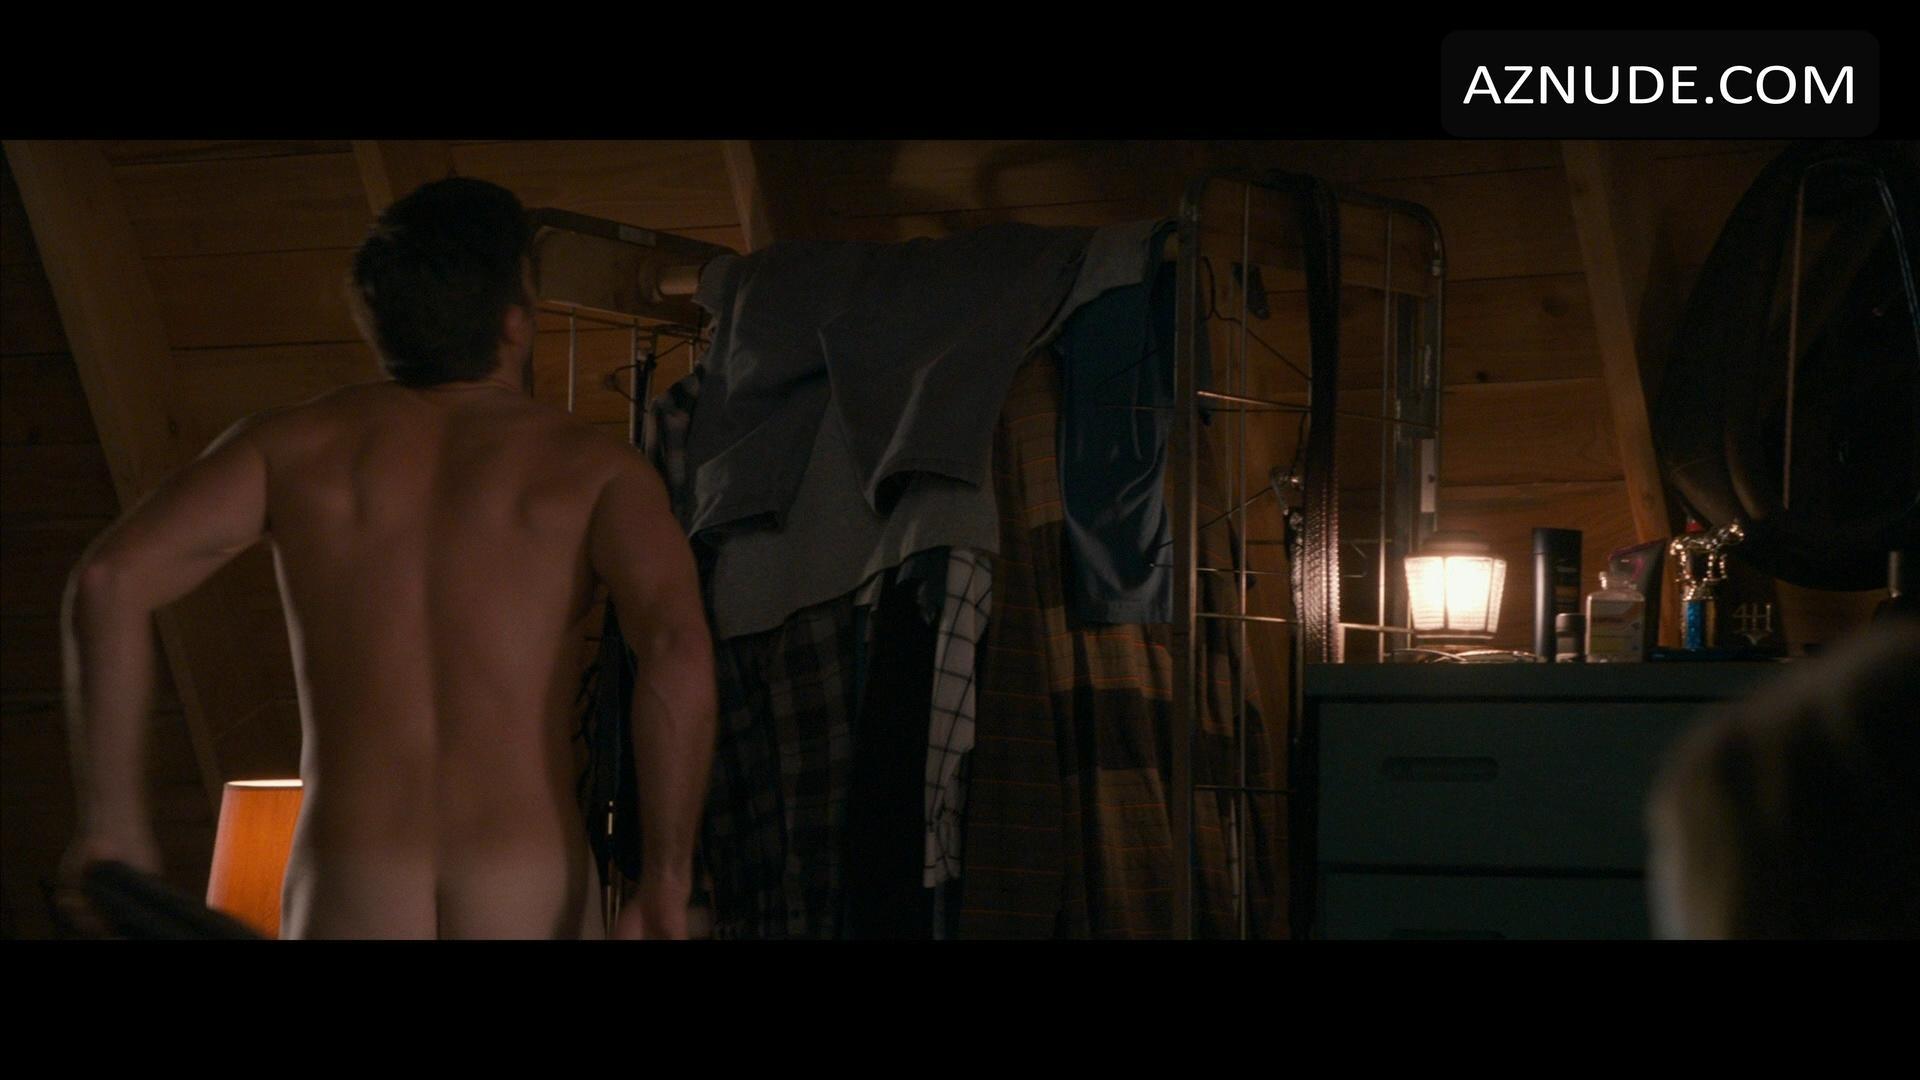 Nude girl butt hole gif